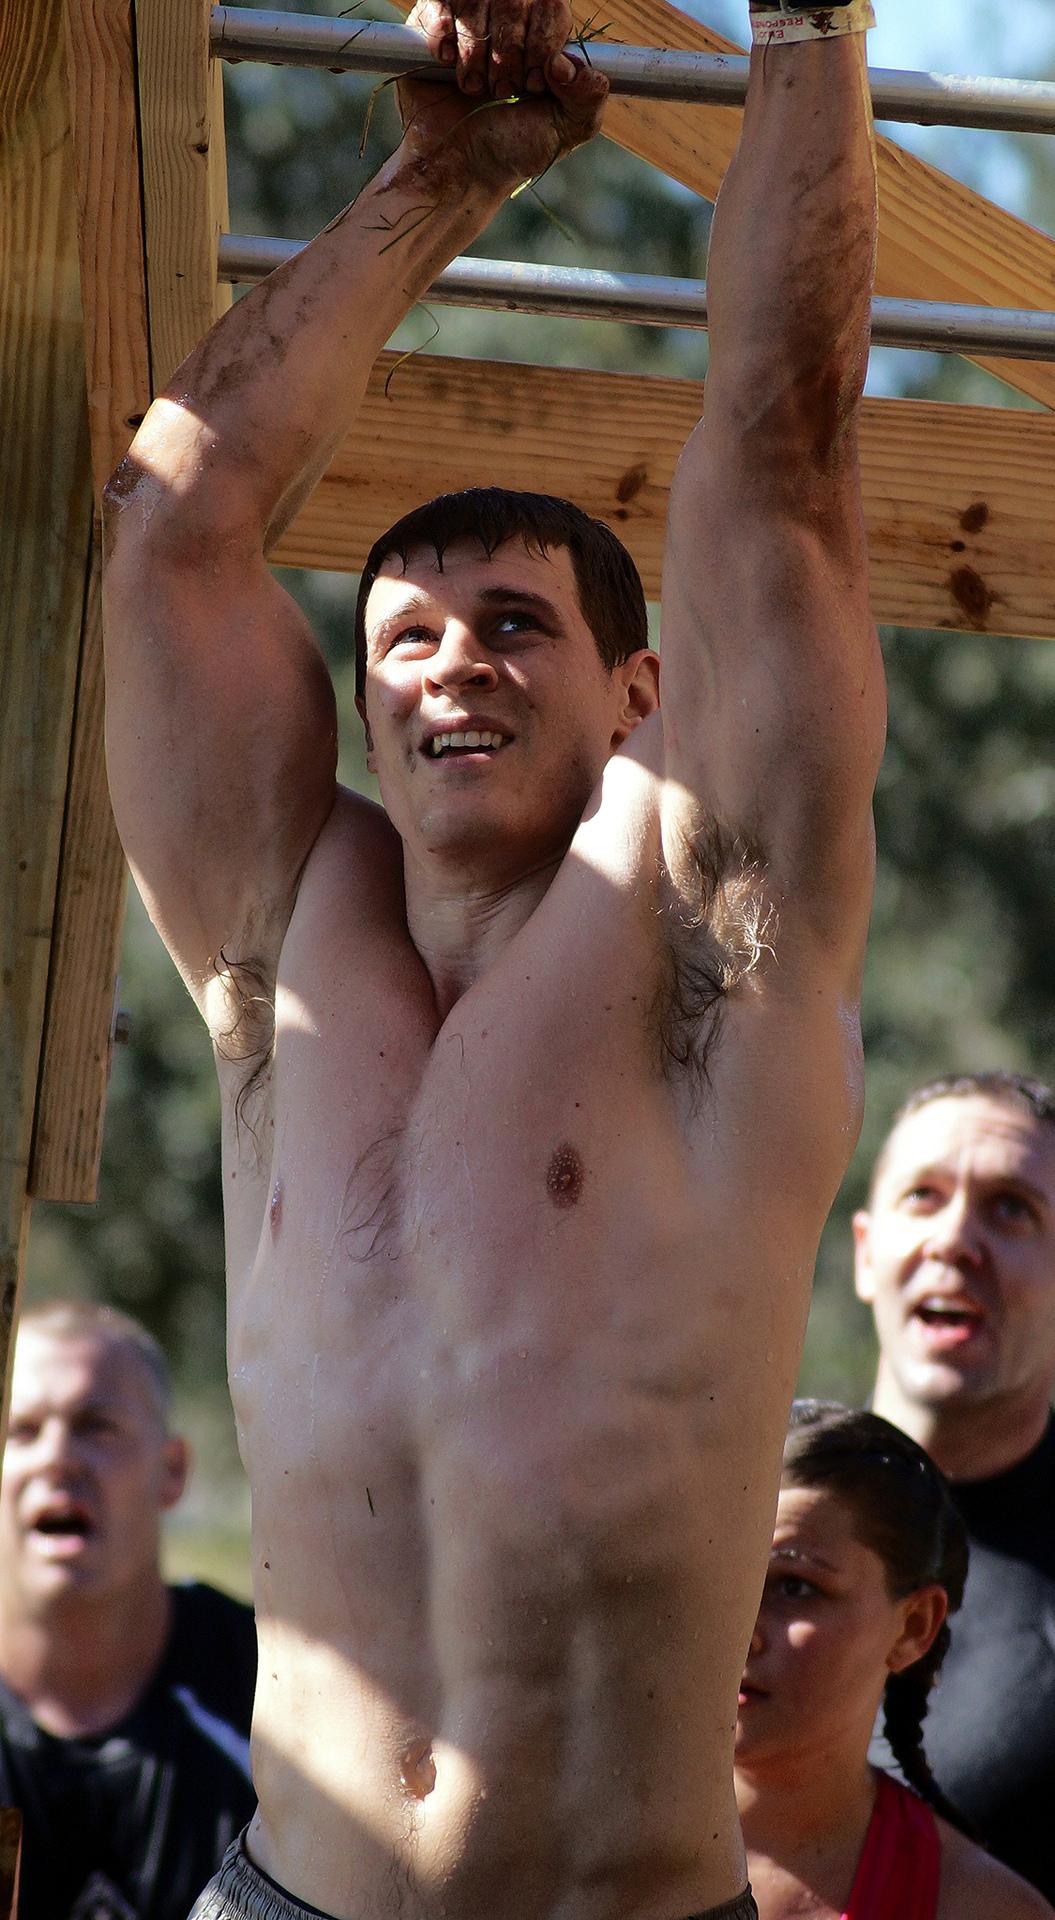 American Ninja Warrior Workout with monkey Bars